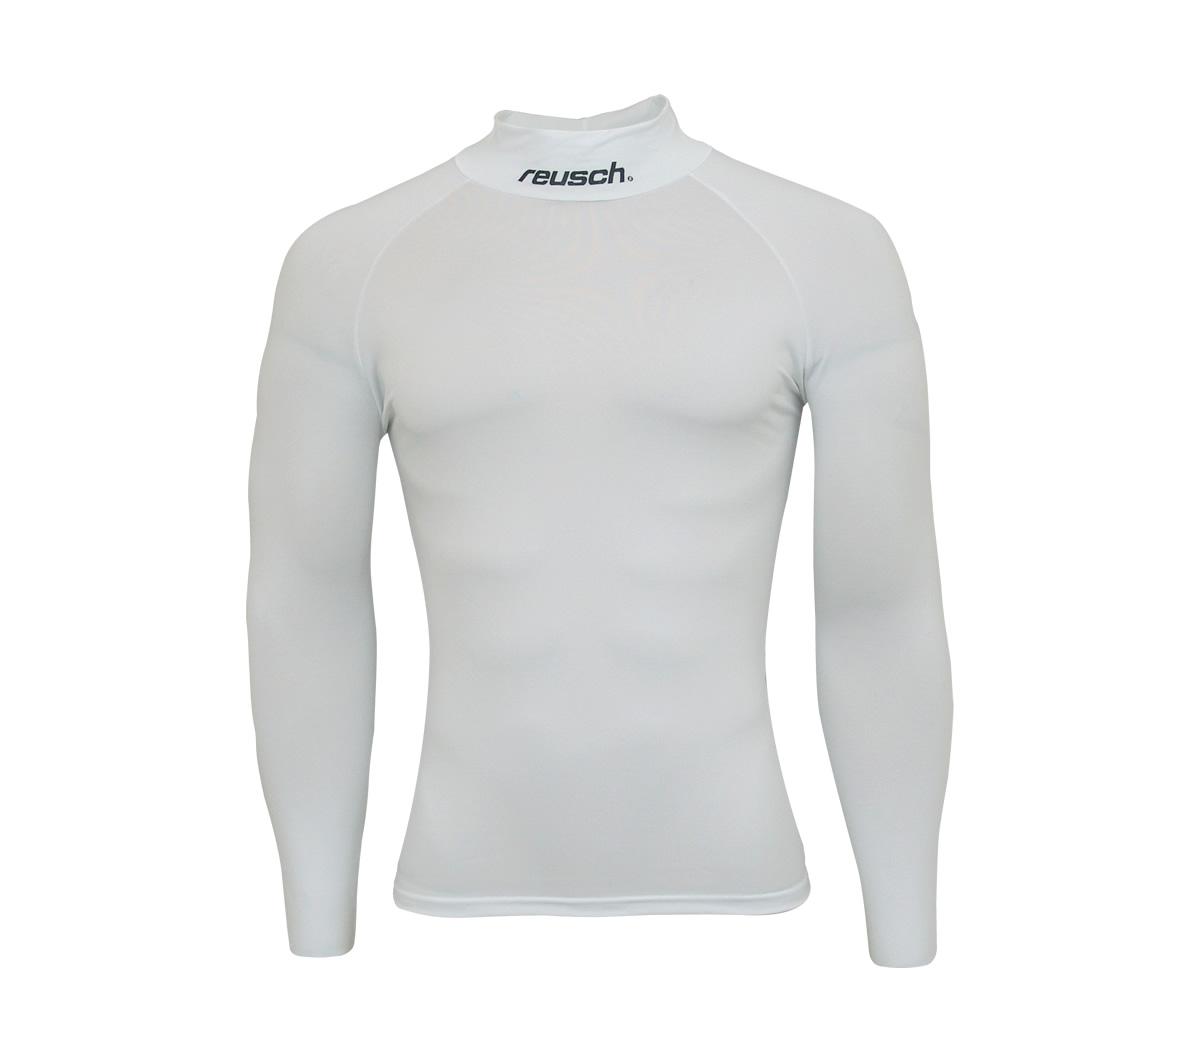 Camisa Térmica Reusch Underjersey Gola Alta Branca Camisa Térmica Reusch  Underjersey Gola Alta Branca ... 946ef0d3329c8